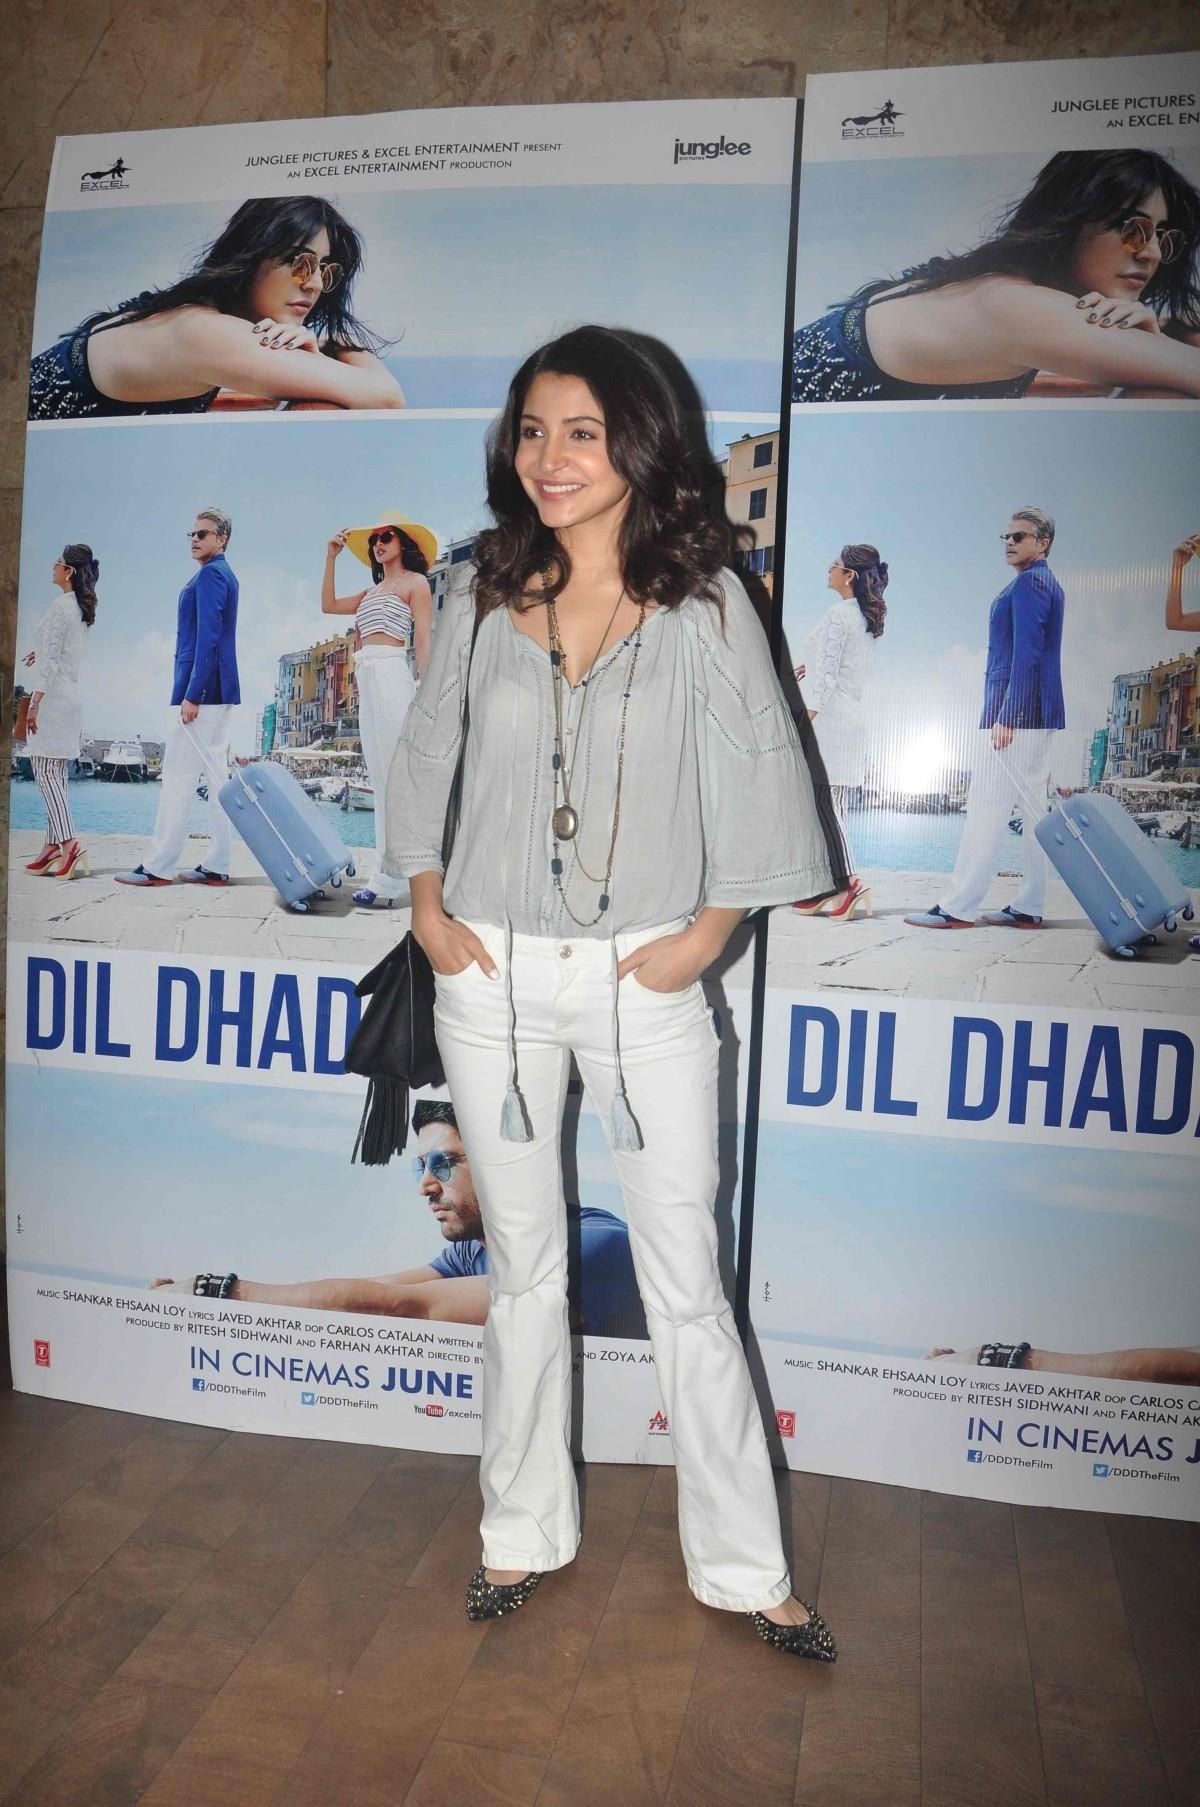 Anushka Sharma Attend the special screening of 'Dil Dhadakne Do'